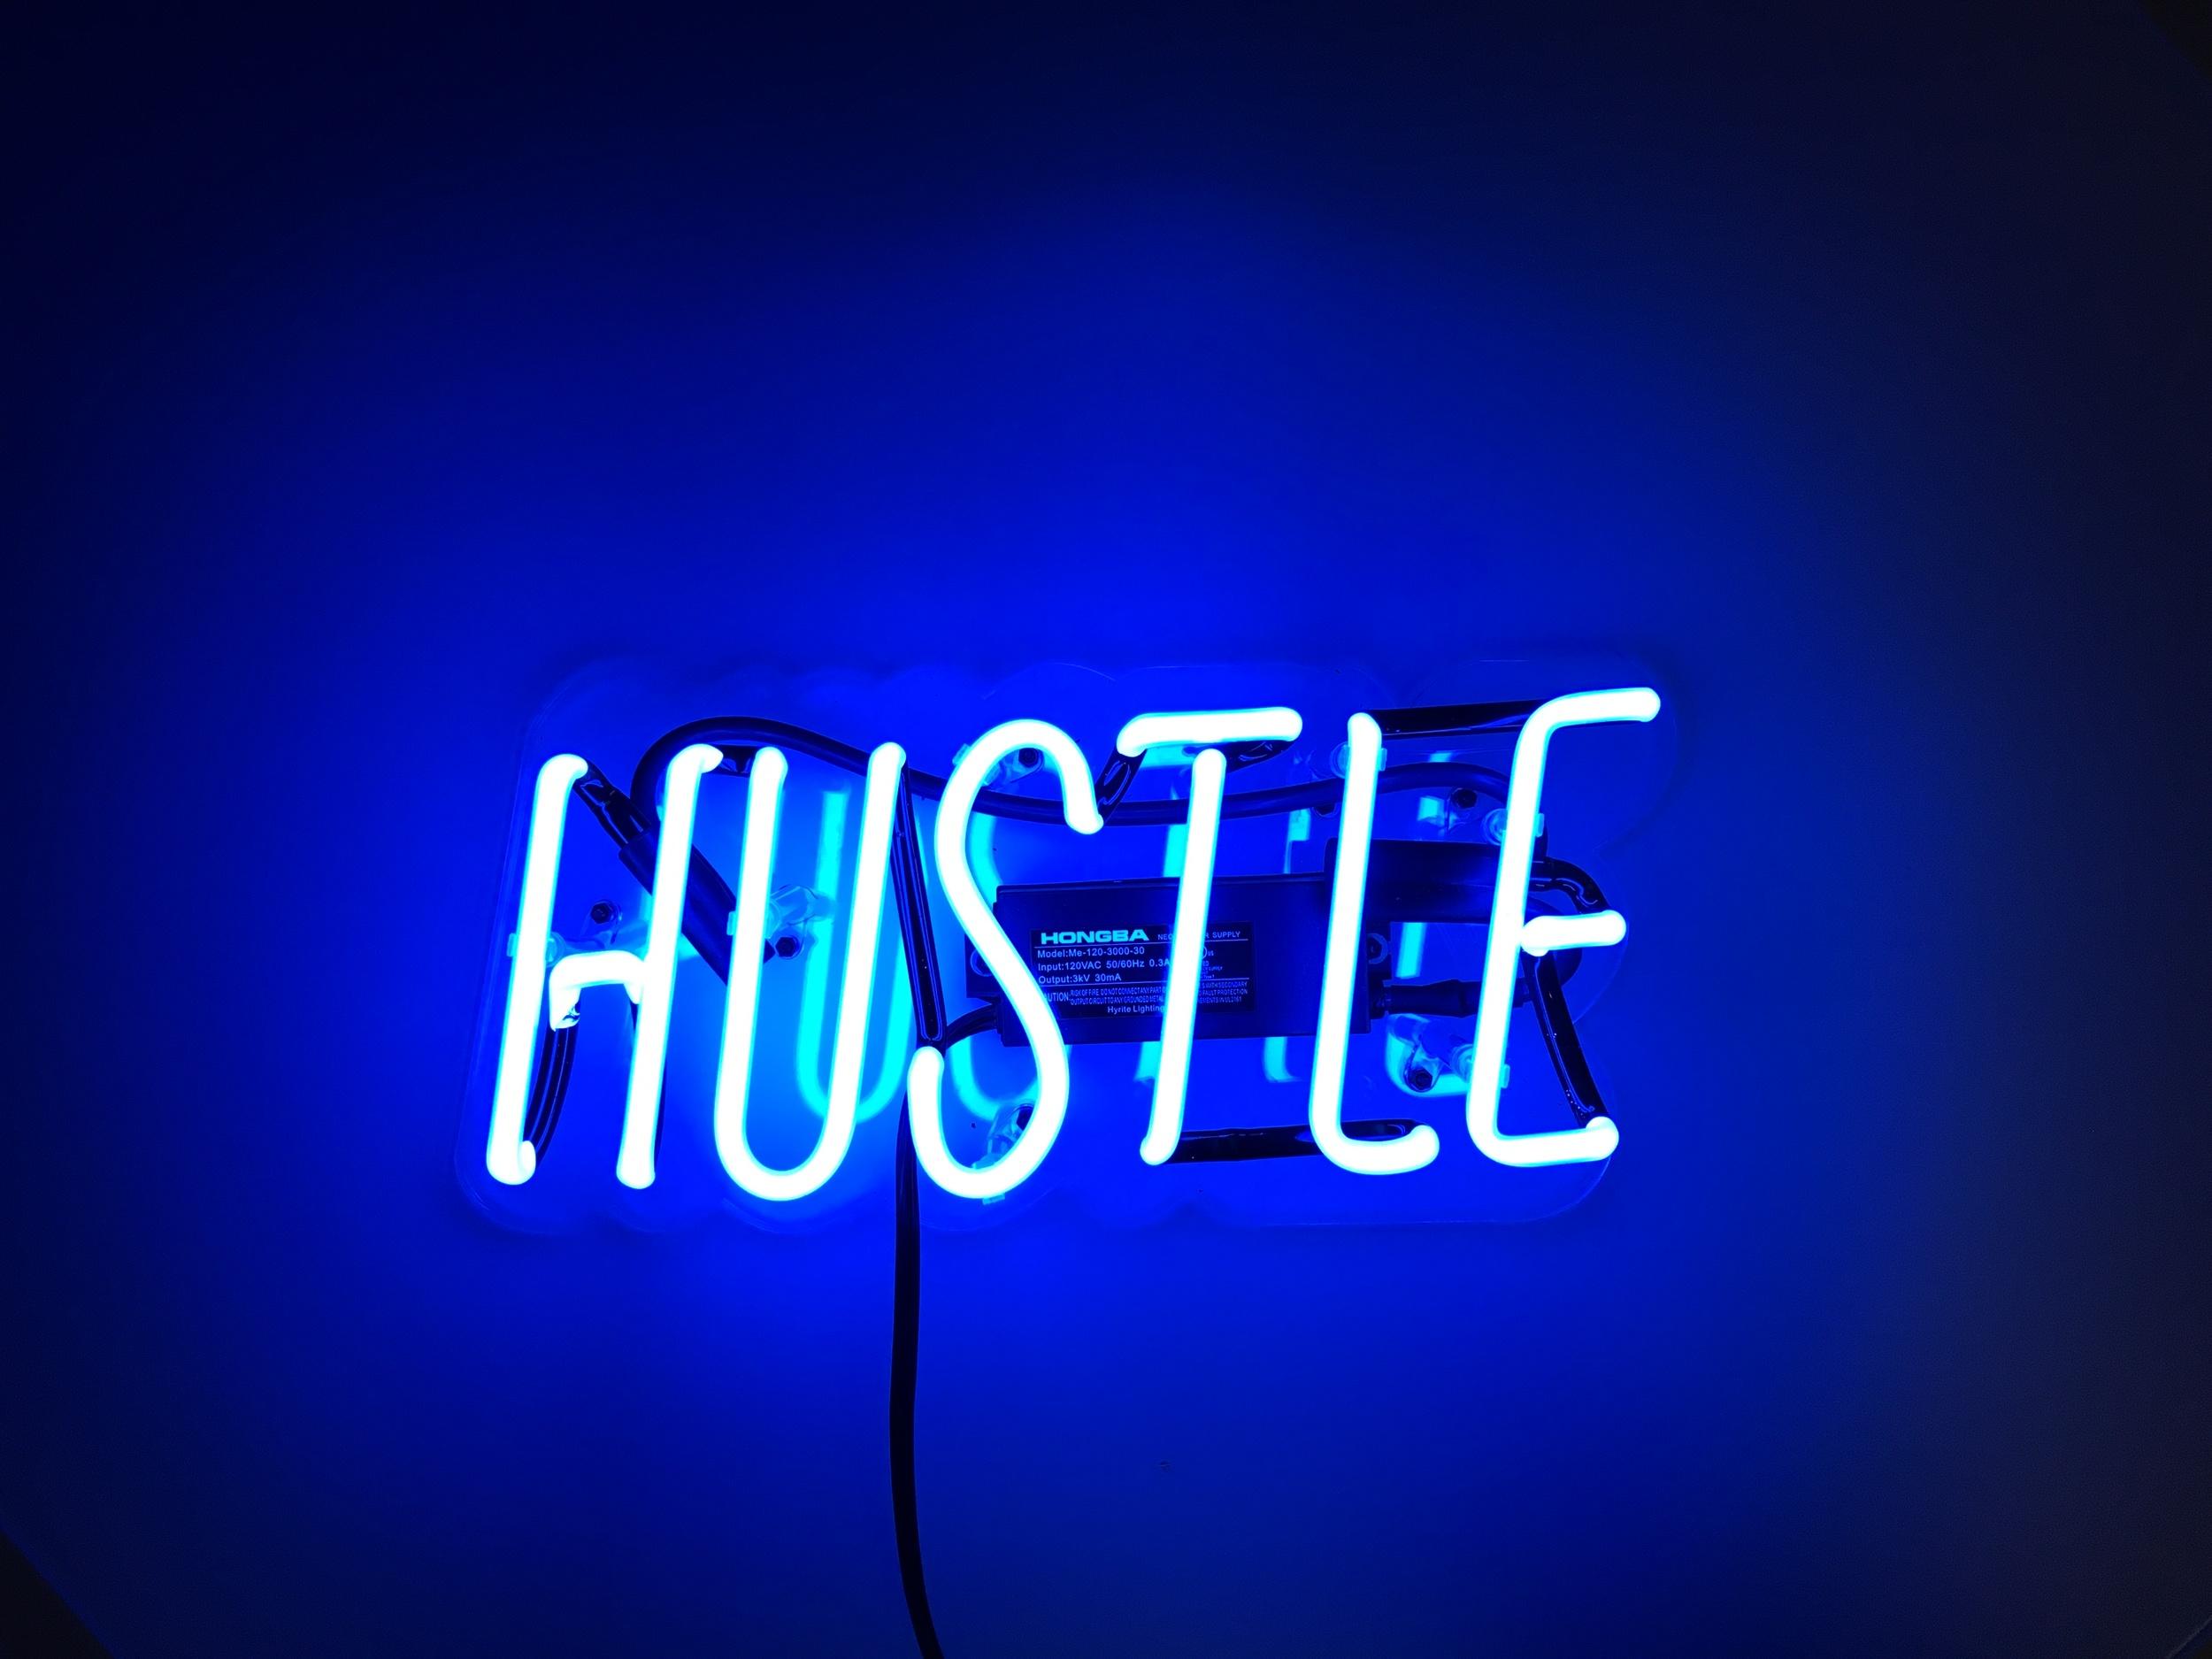 Hustle_Blue.jpg